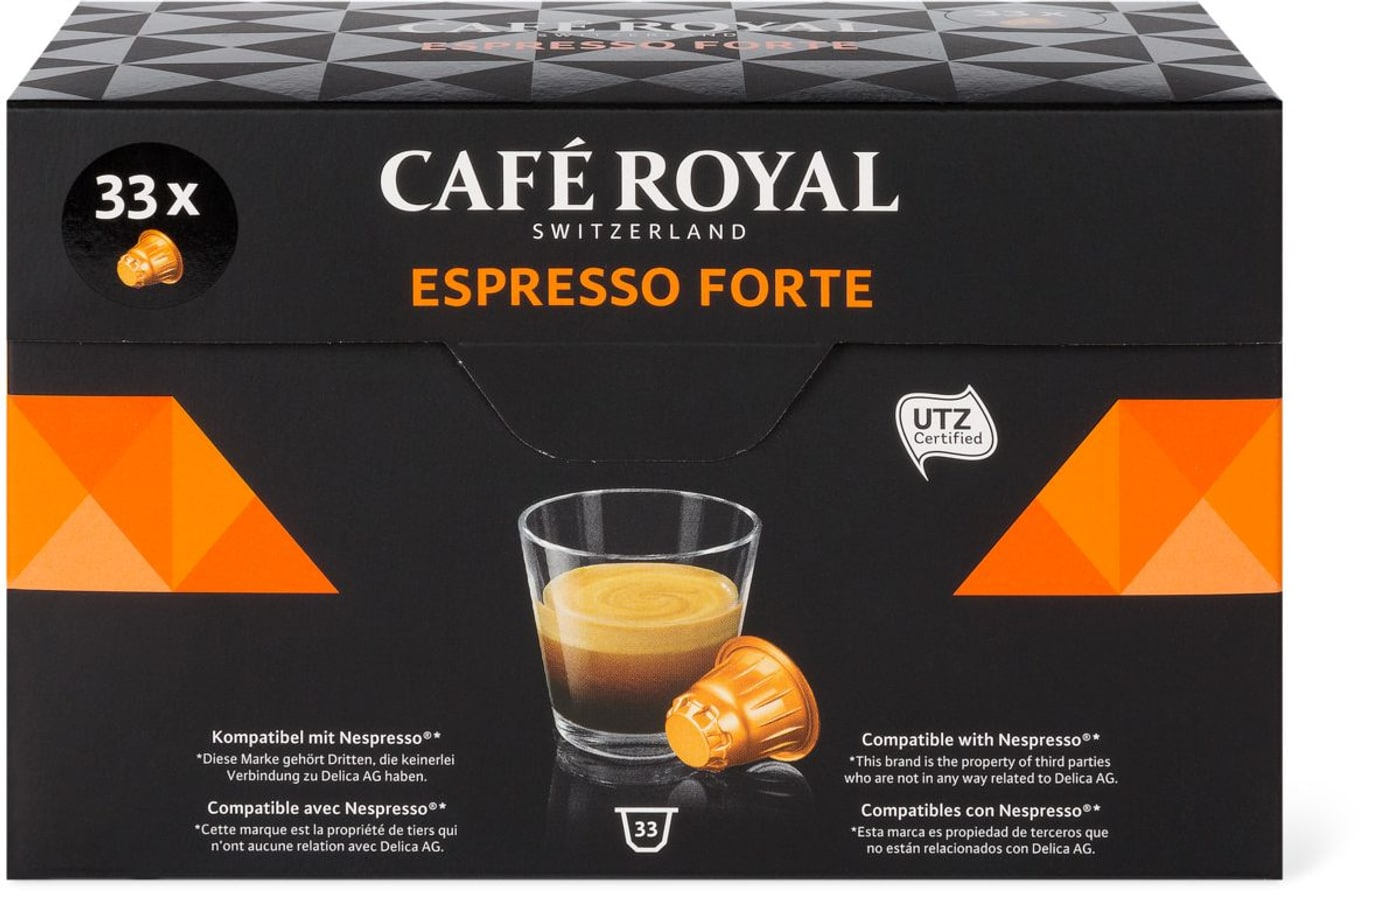 Café Royal Espresso Forte 33 Kapseln